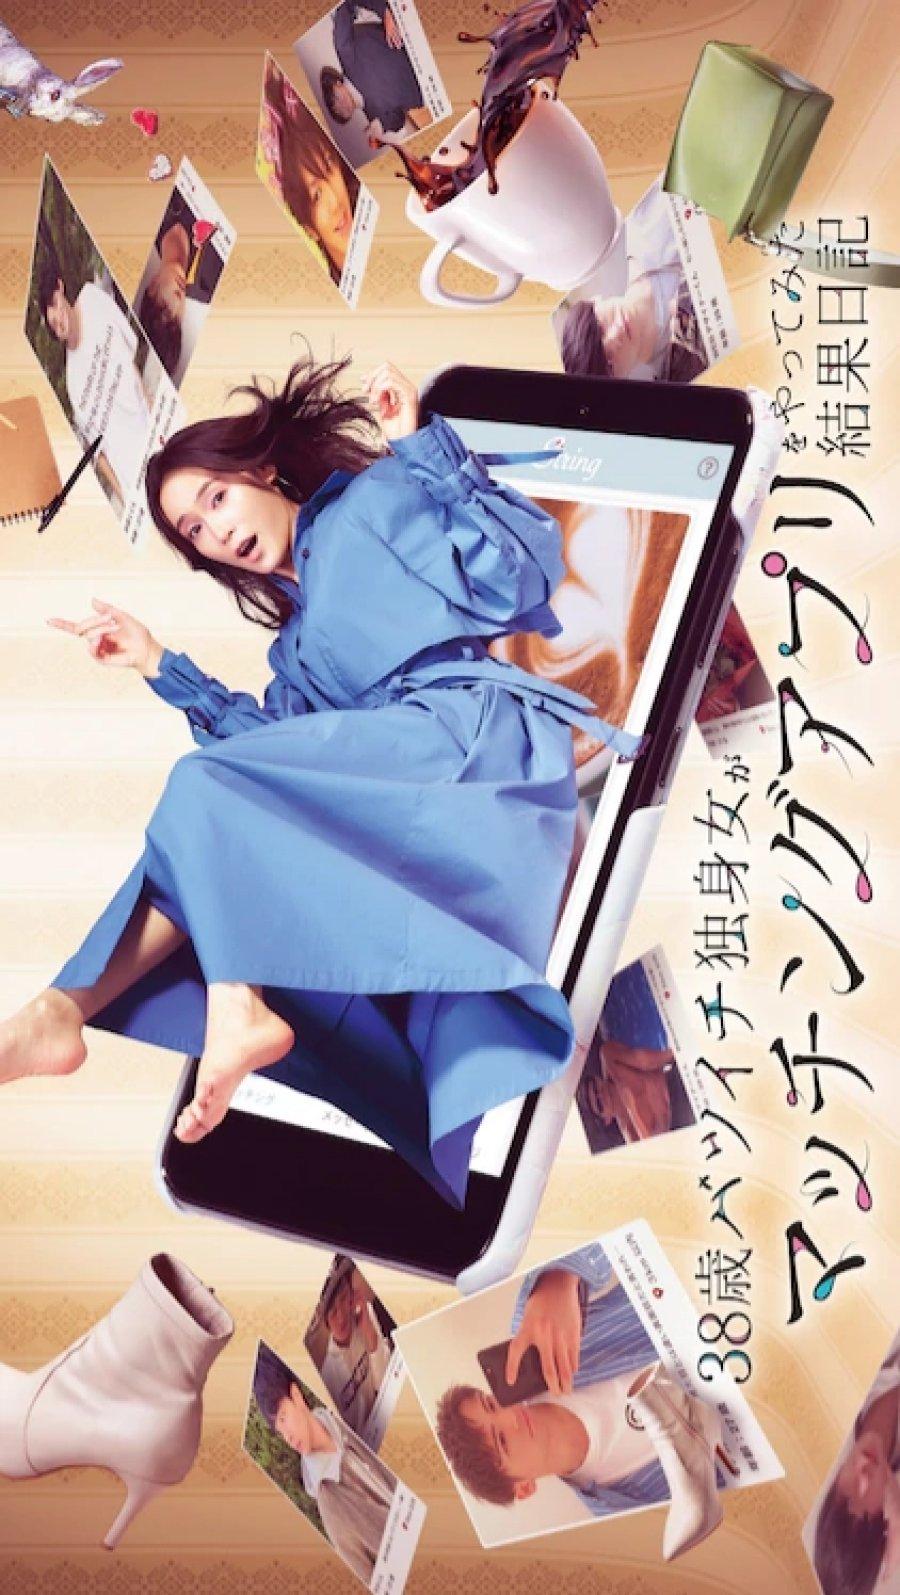 >38sai Batsuichi Dokushin Onna ga Matching Apuri wo Yattemita Kekka Nikki (2020) ตอนที่ 1-6 ซับไทย